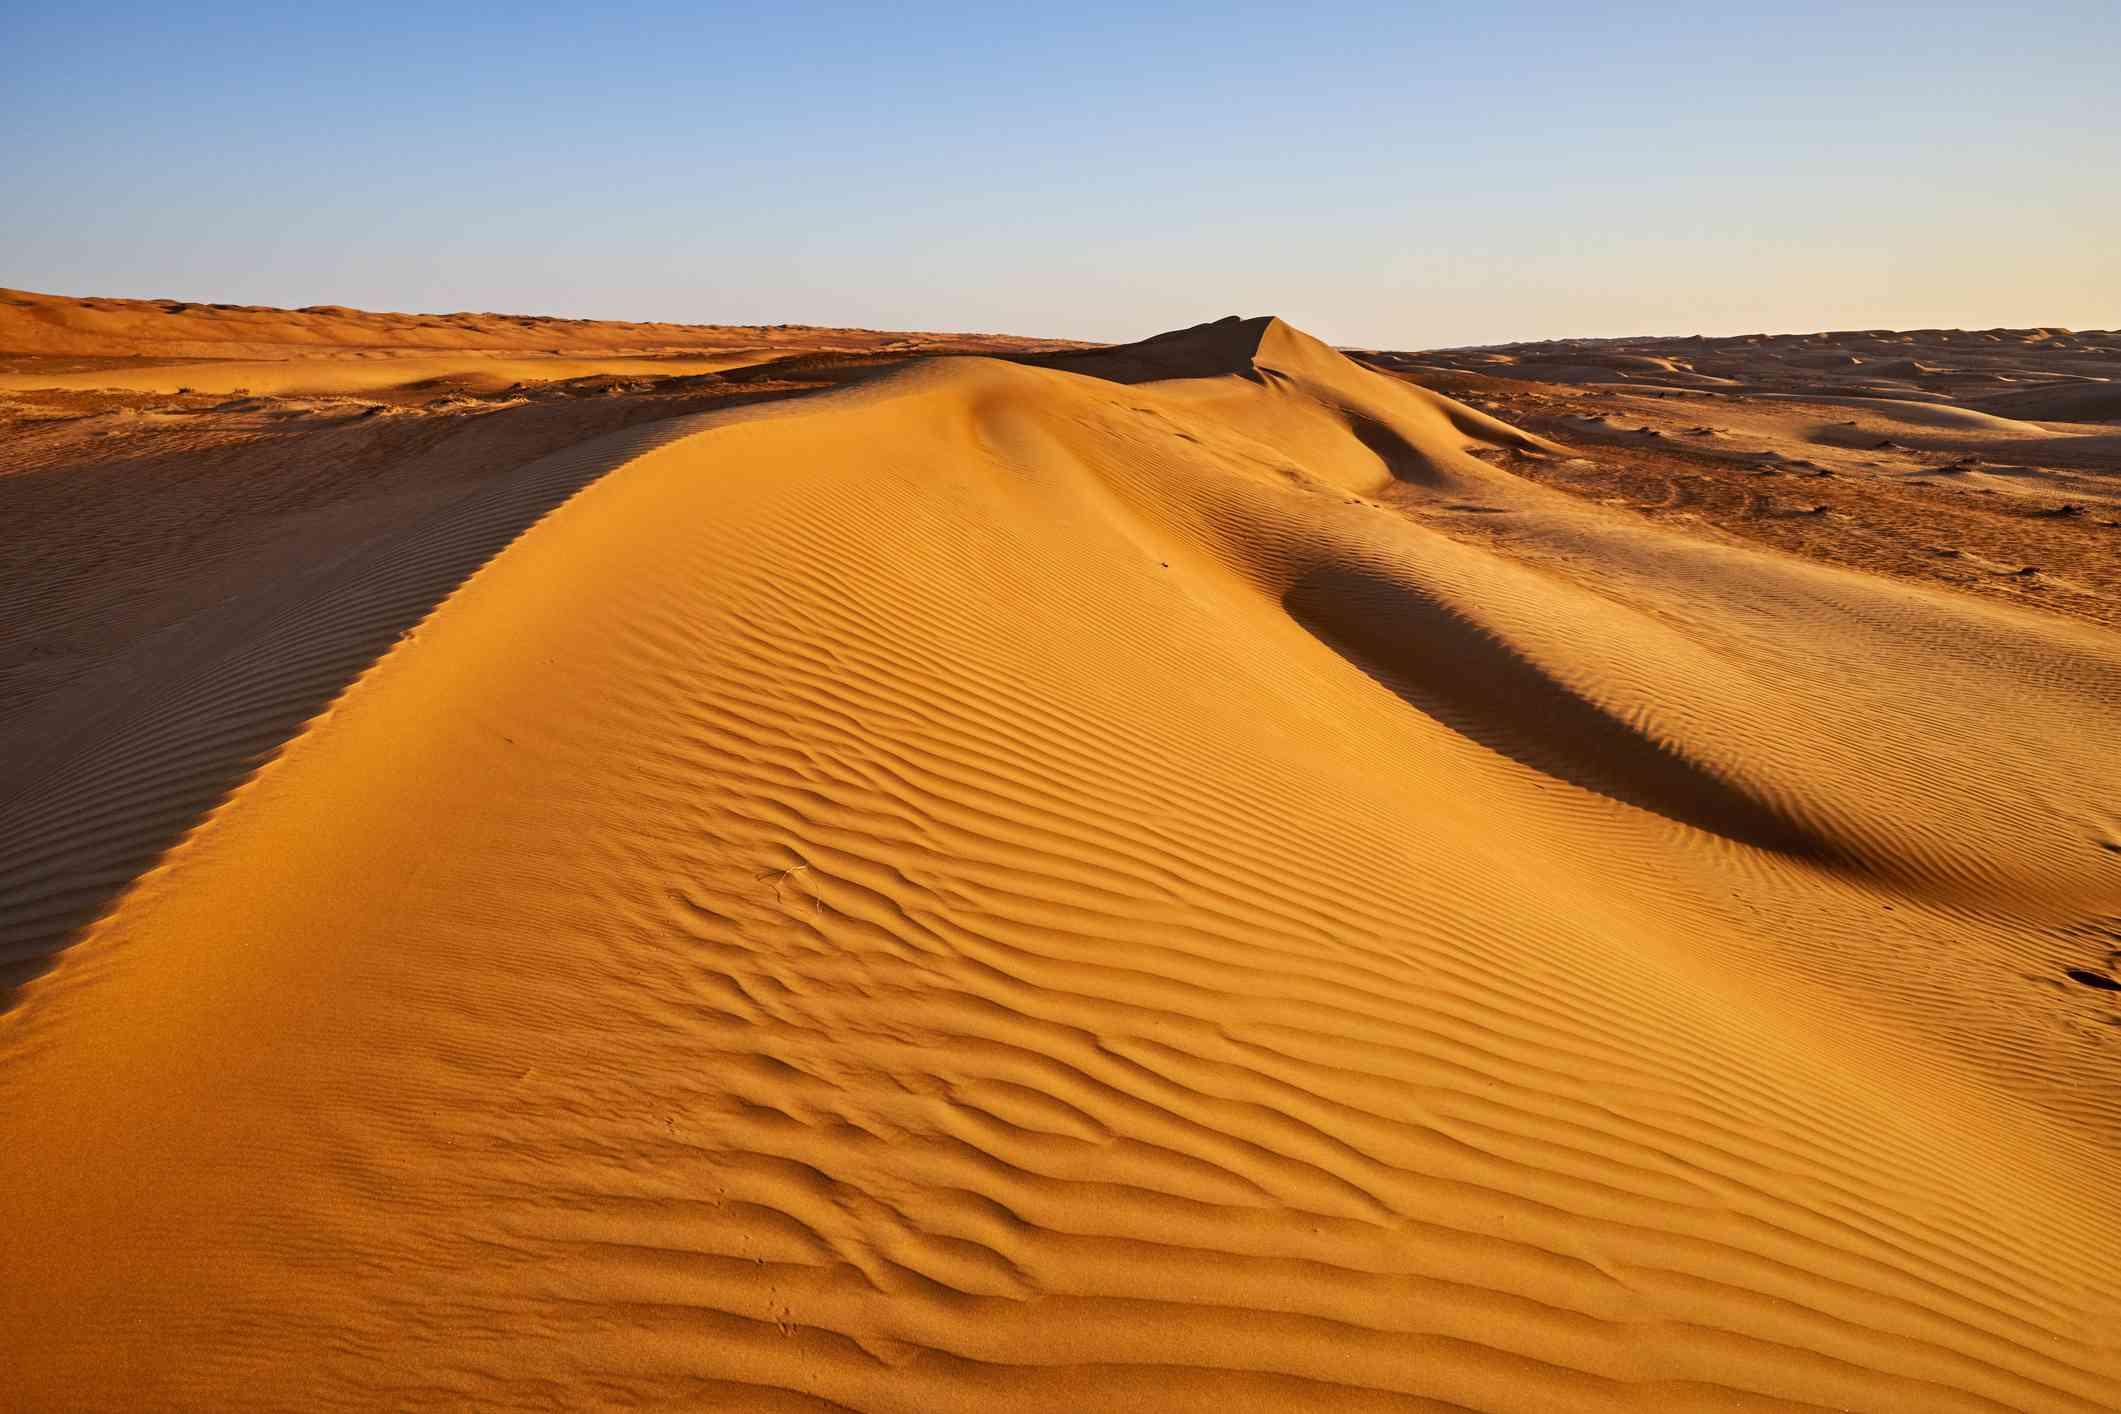 Large sand dune in golden light Sharqiya Sands/Wahibia Sands